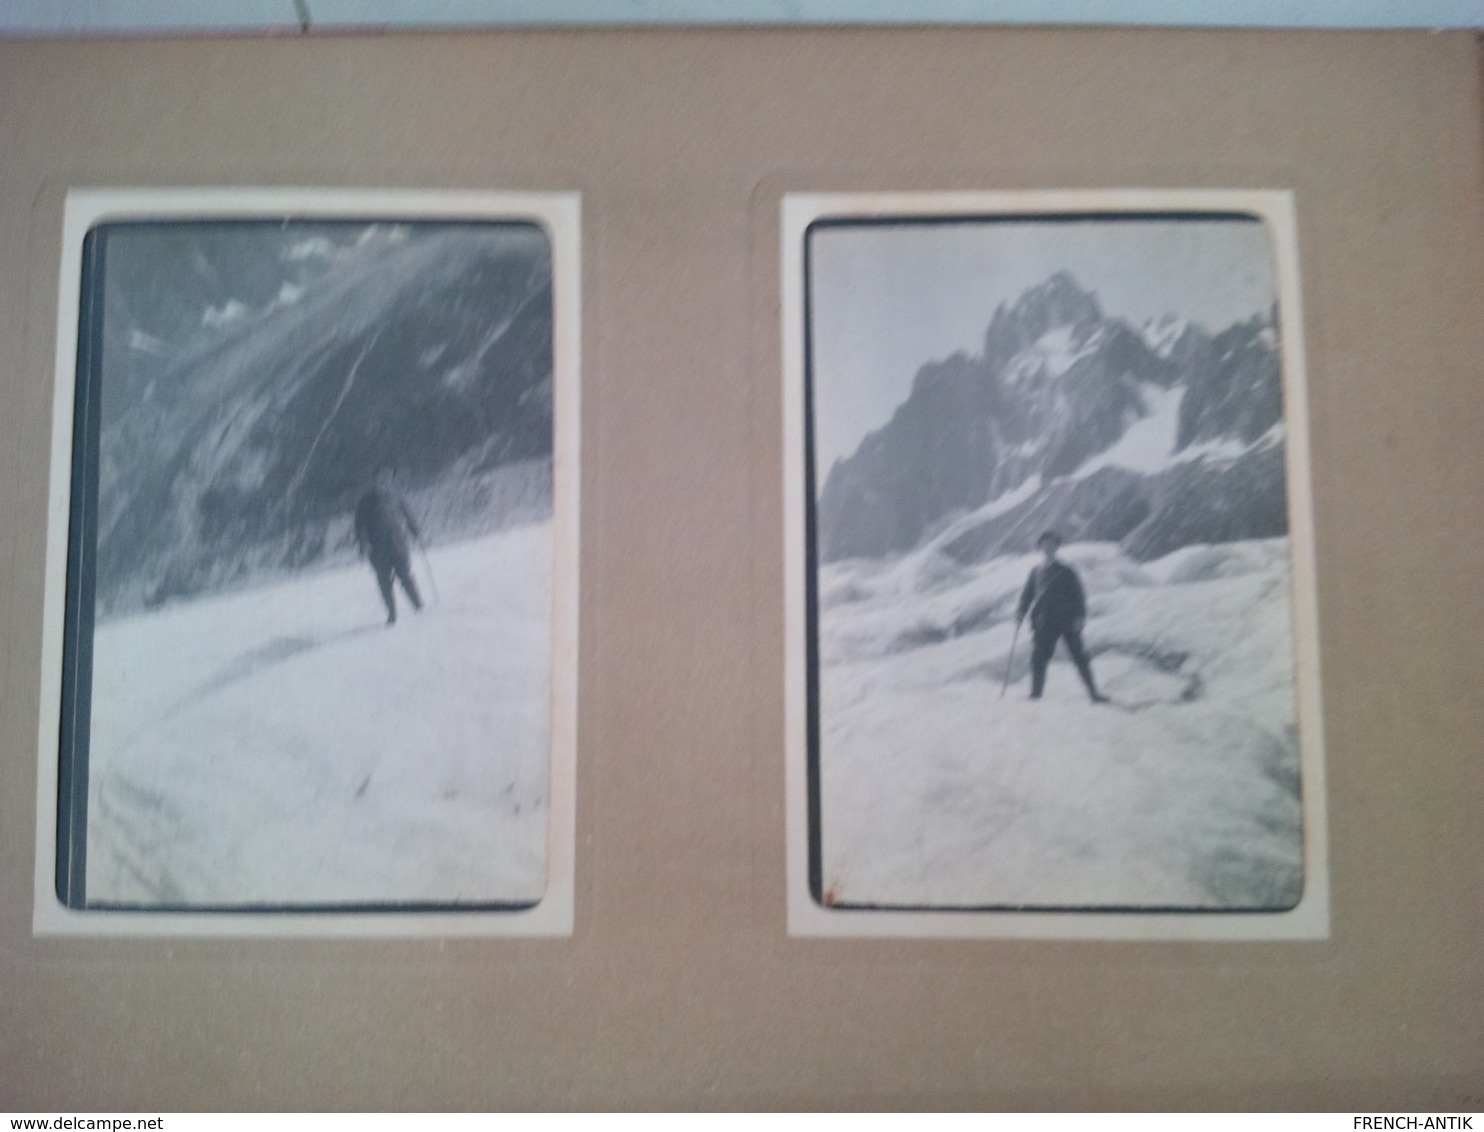 LOT 4 ALBUM SPORTS D HIVER MONTAGNE ZERMATT GRUNDENWALD BERNE MONT ST BERNARD BERN OURS CHIEN SKI - Albums & Collections